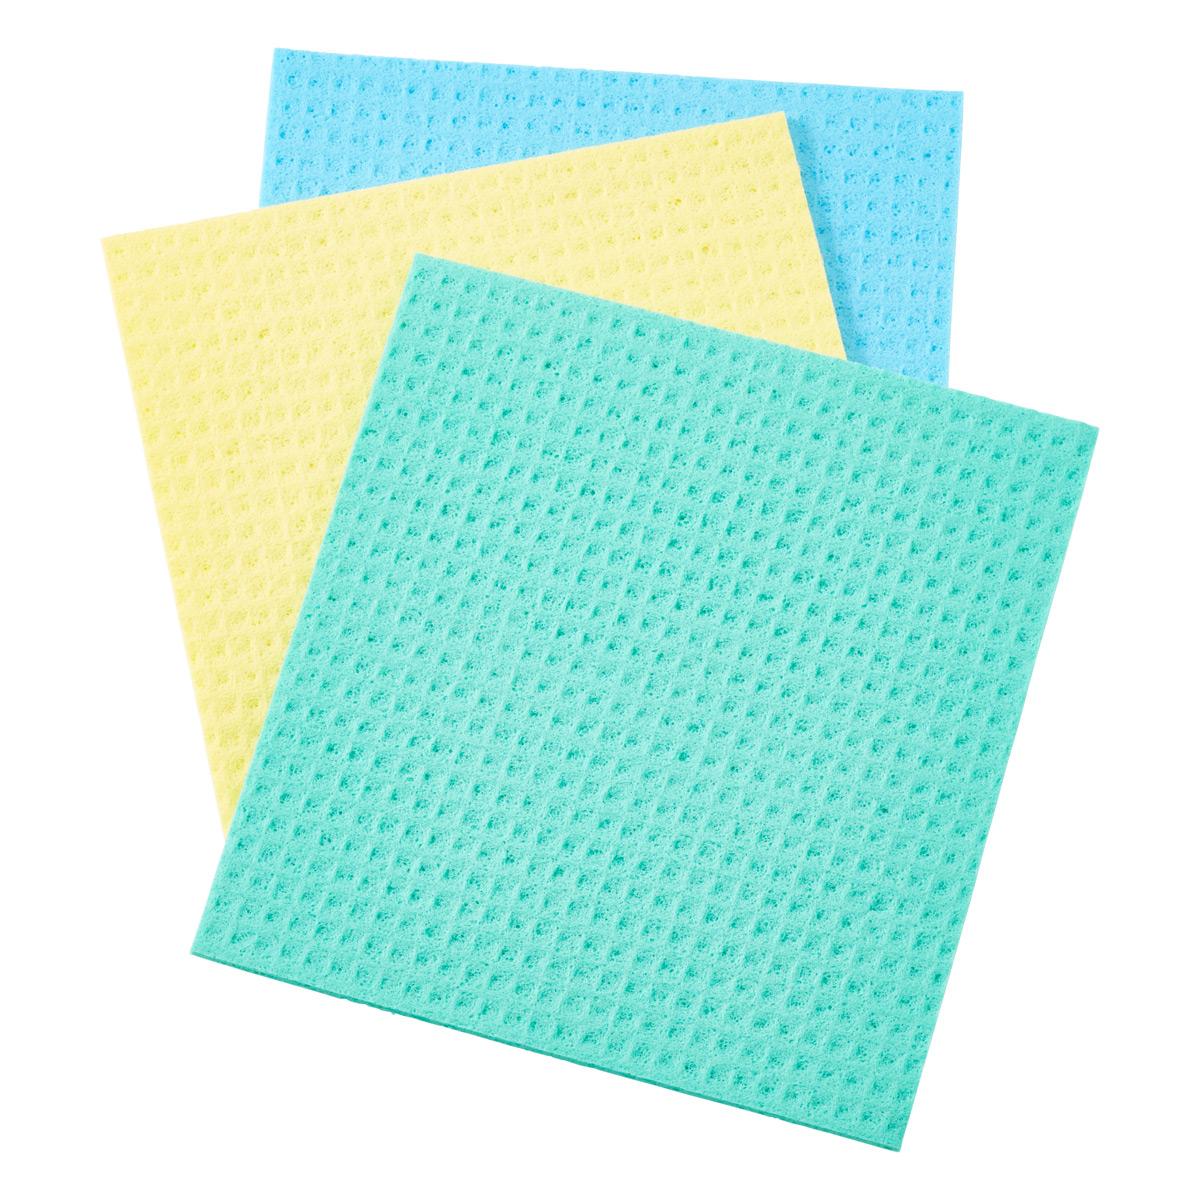 Full Circle Cellulose Sponge Cloths